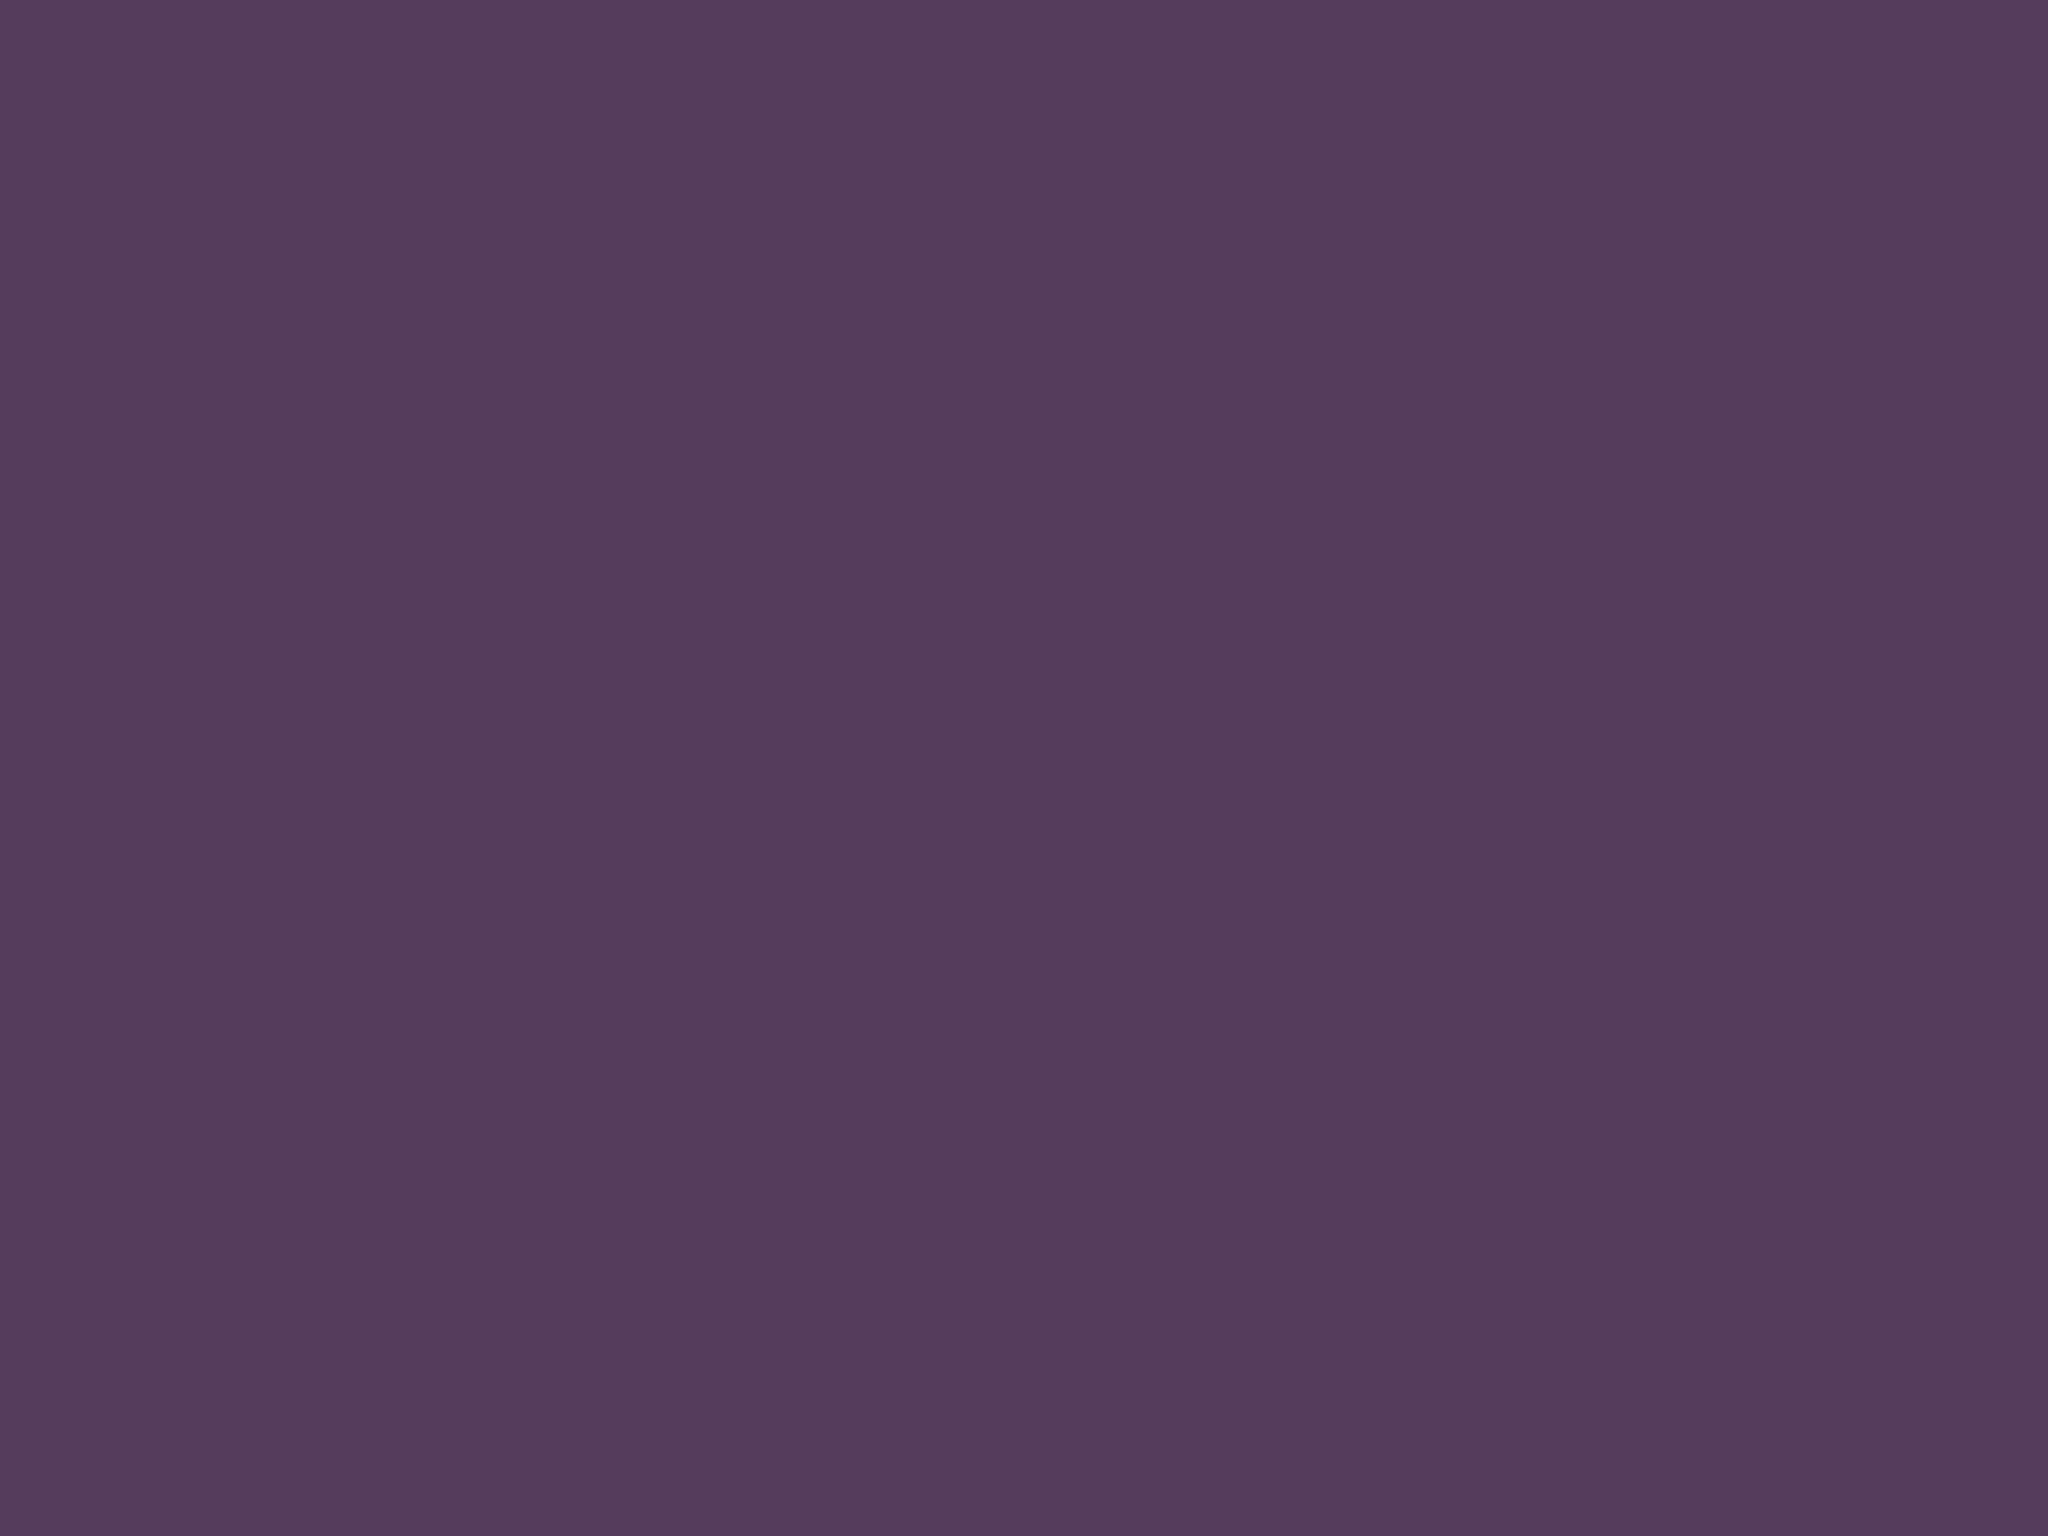 2048x1536 English Violet Solid Color Background